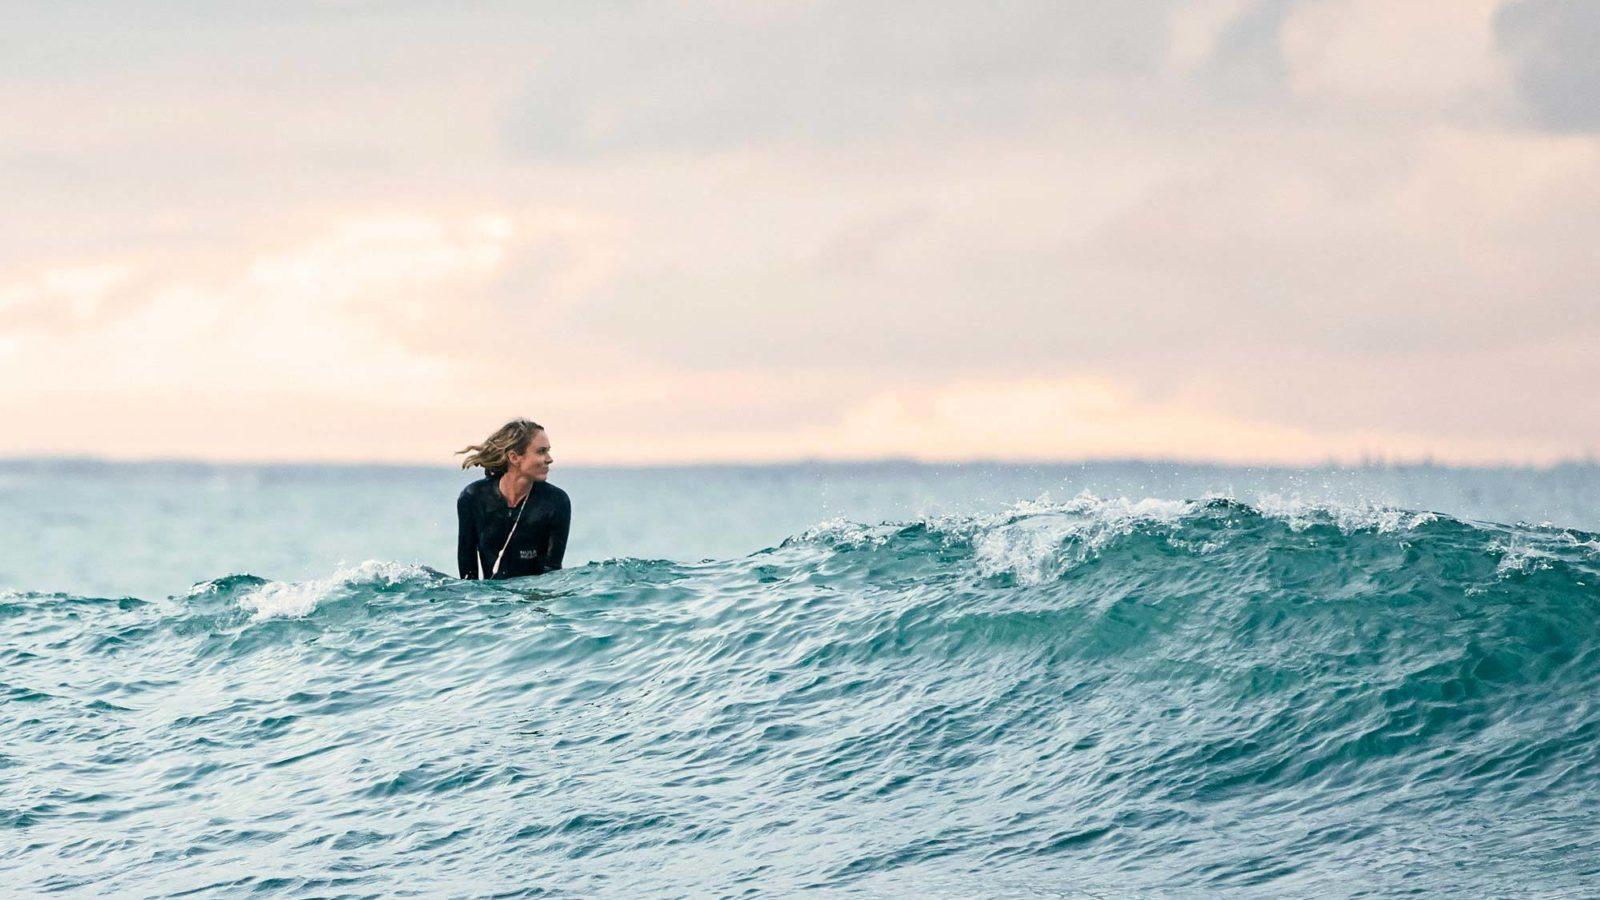 Jada surfing saltwater point barrington coast nsw